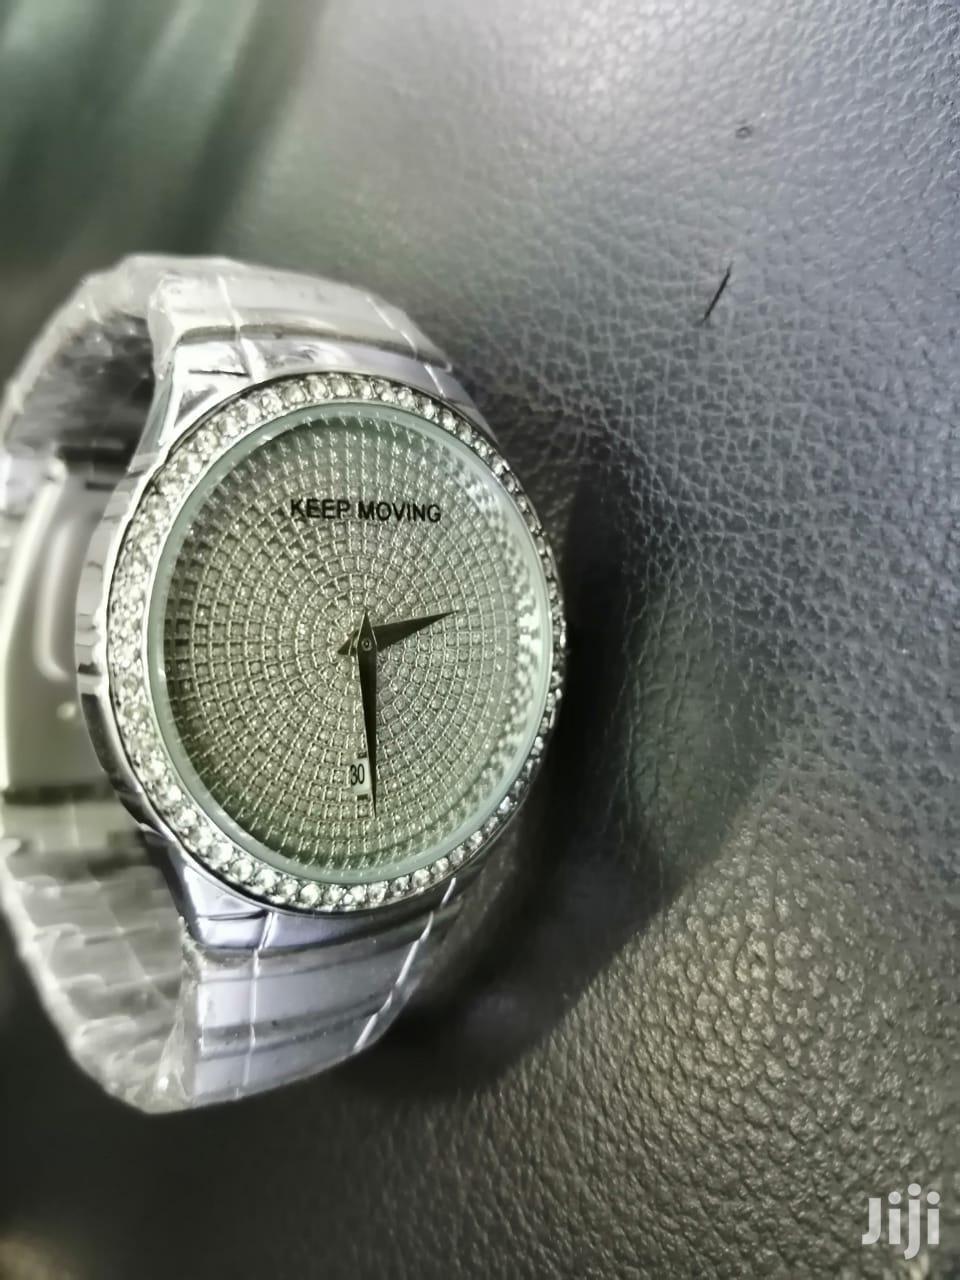 Keep Moving Unique Quality Timepiece